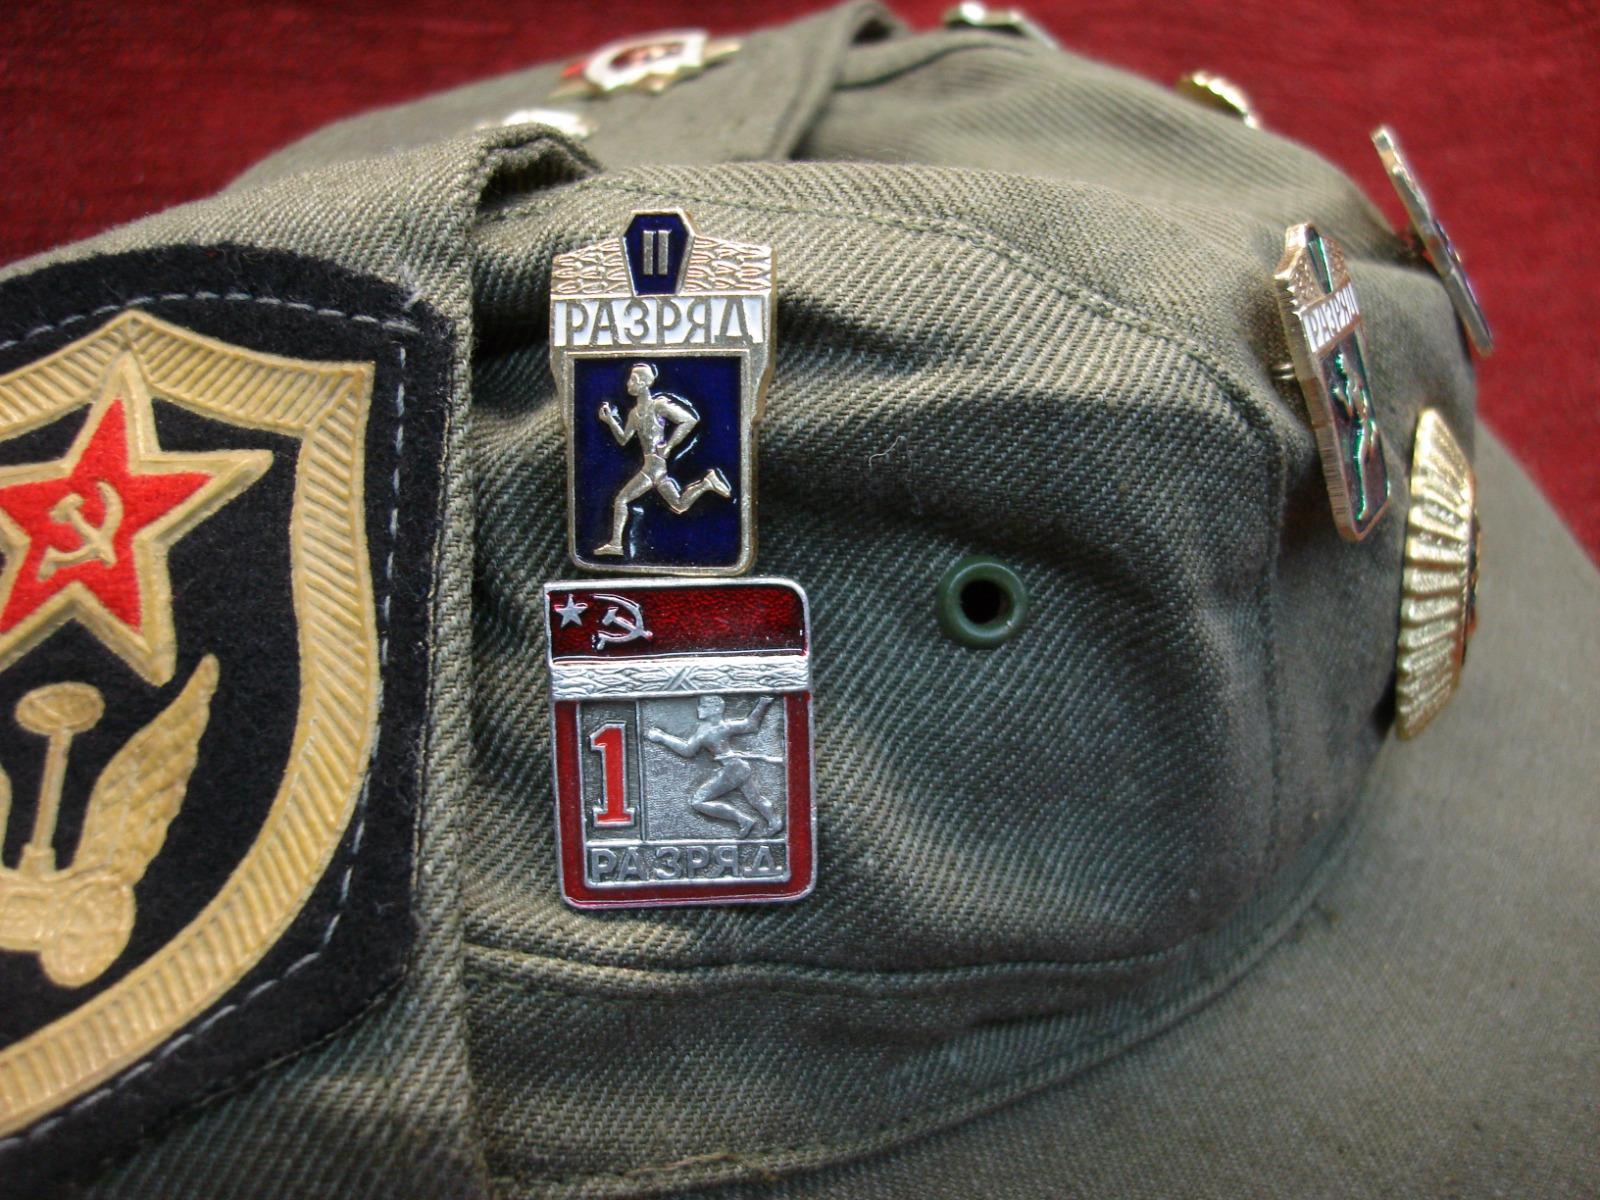 soviet military cap with